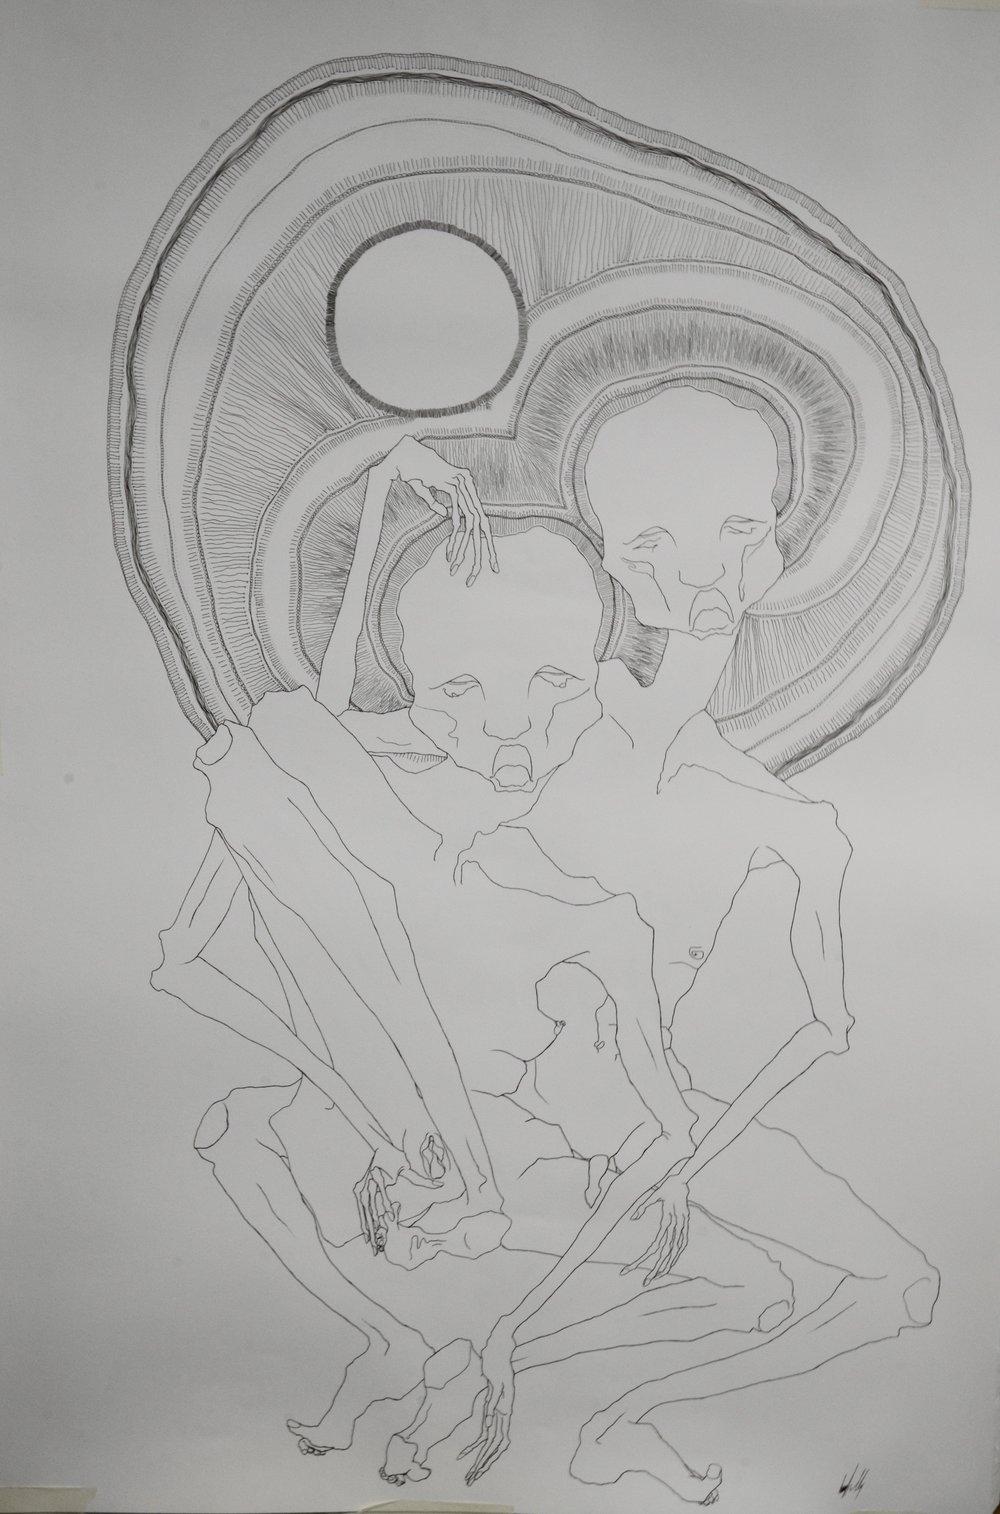 """Plato's Symposium #1"" Drawing Kudos Emerging Artist and Designer Awards, Kudos Gallery"